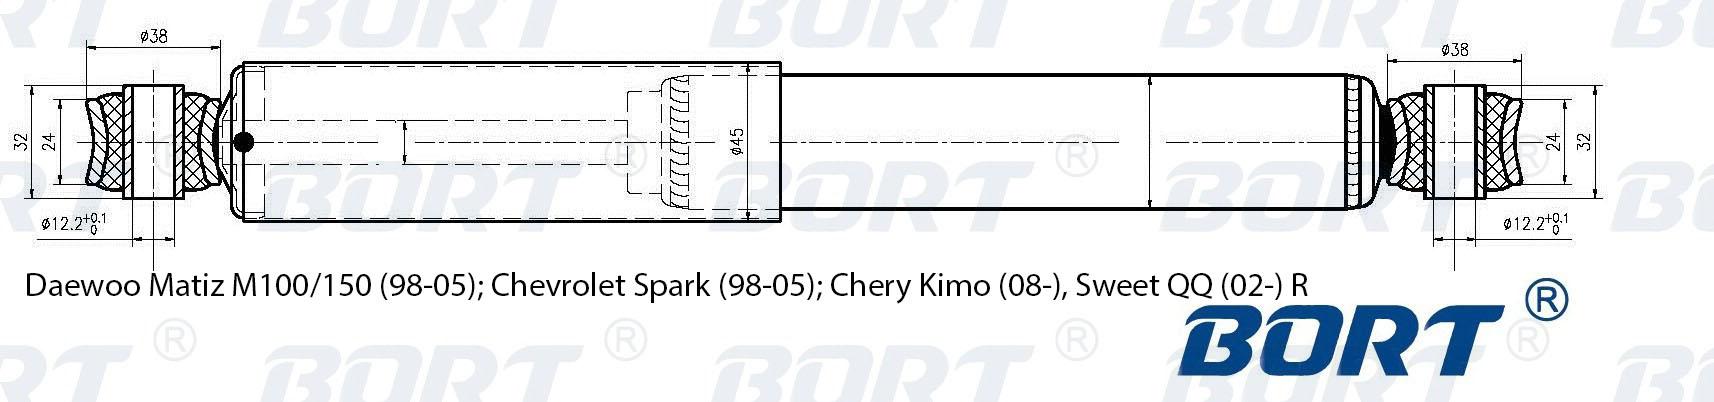 Амортизатор подвески зад газ daewoo matiz m100150 98-05 chevrolet spark 98-05 chery kimo